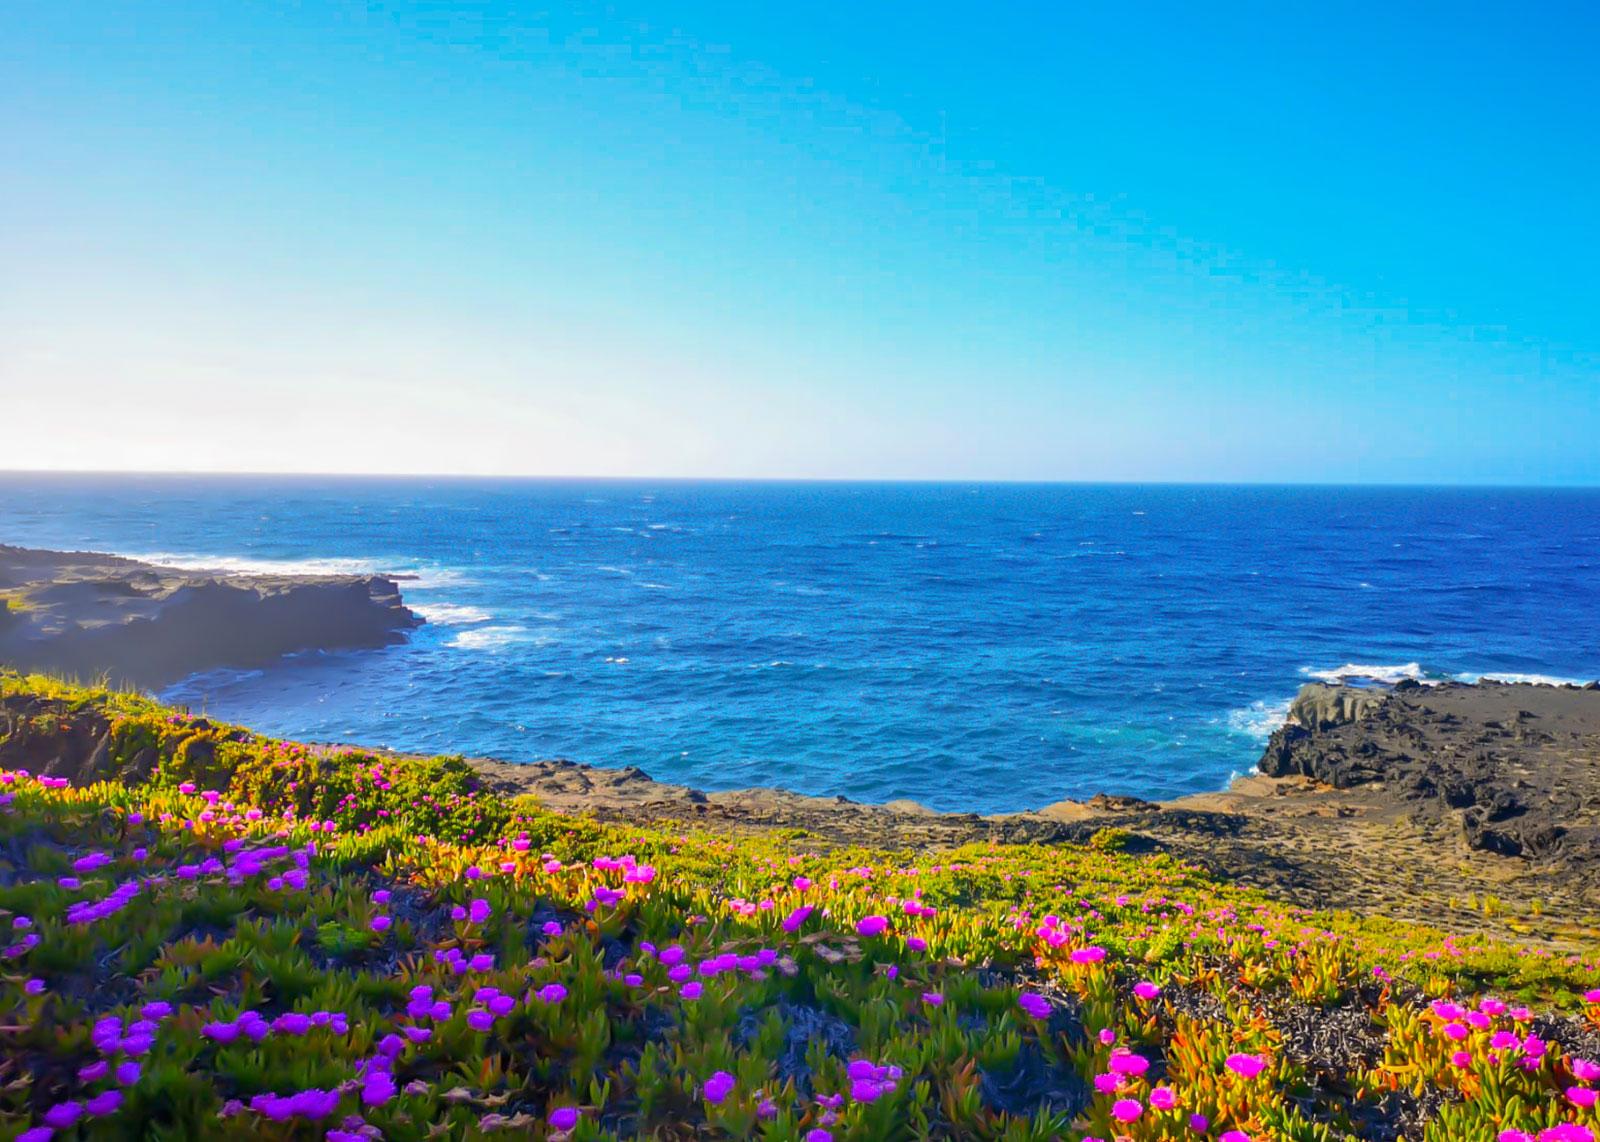 Dammusi-Uliveto-Pantelleria-Isola